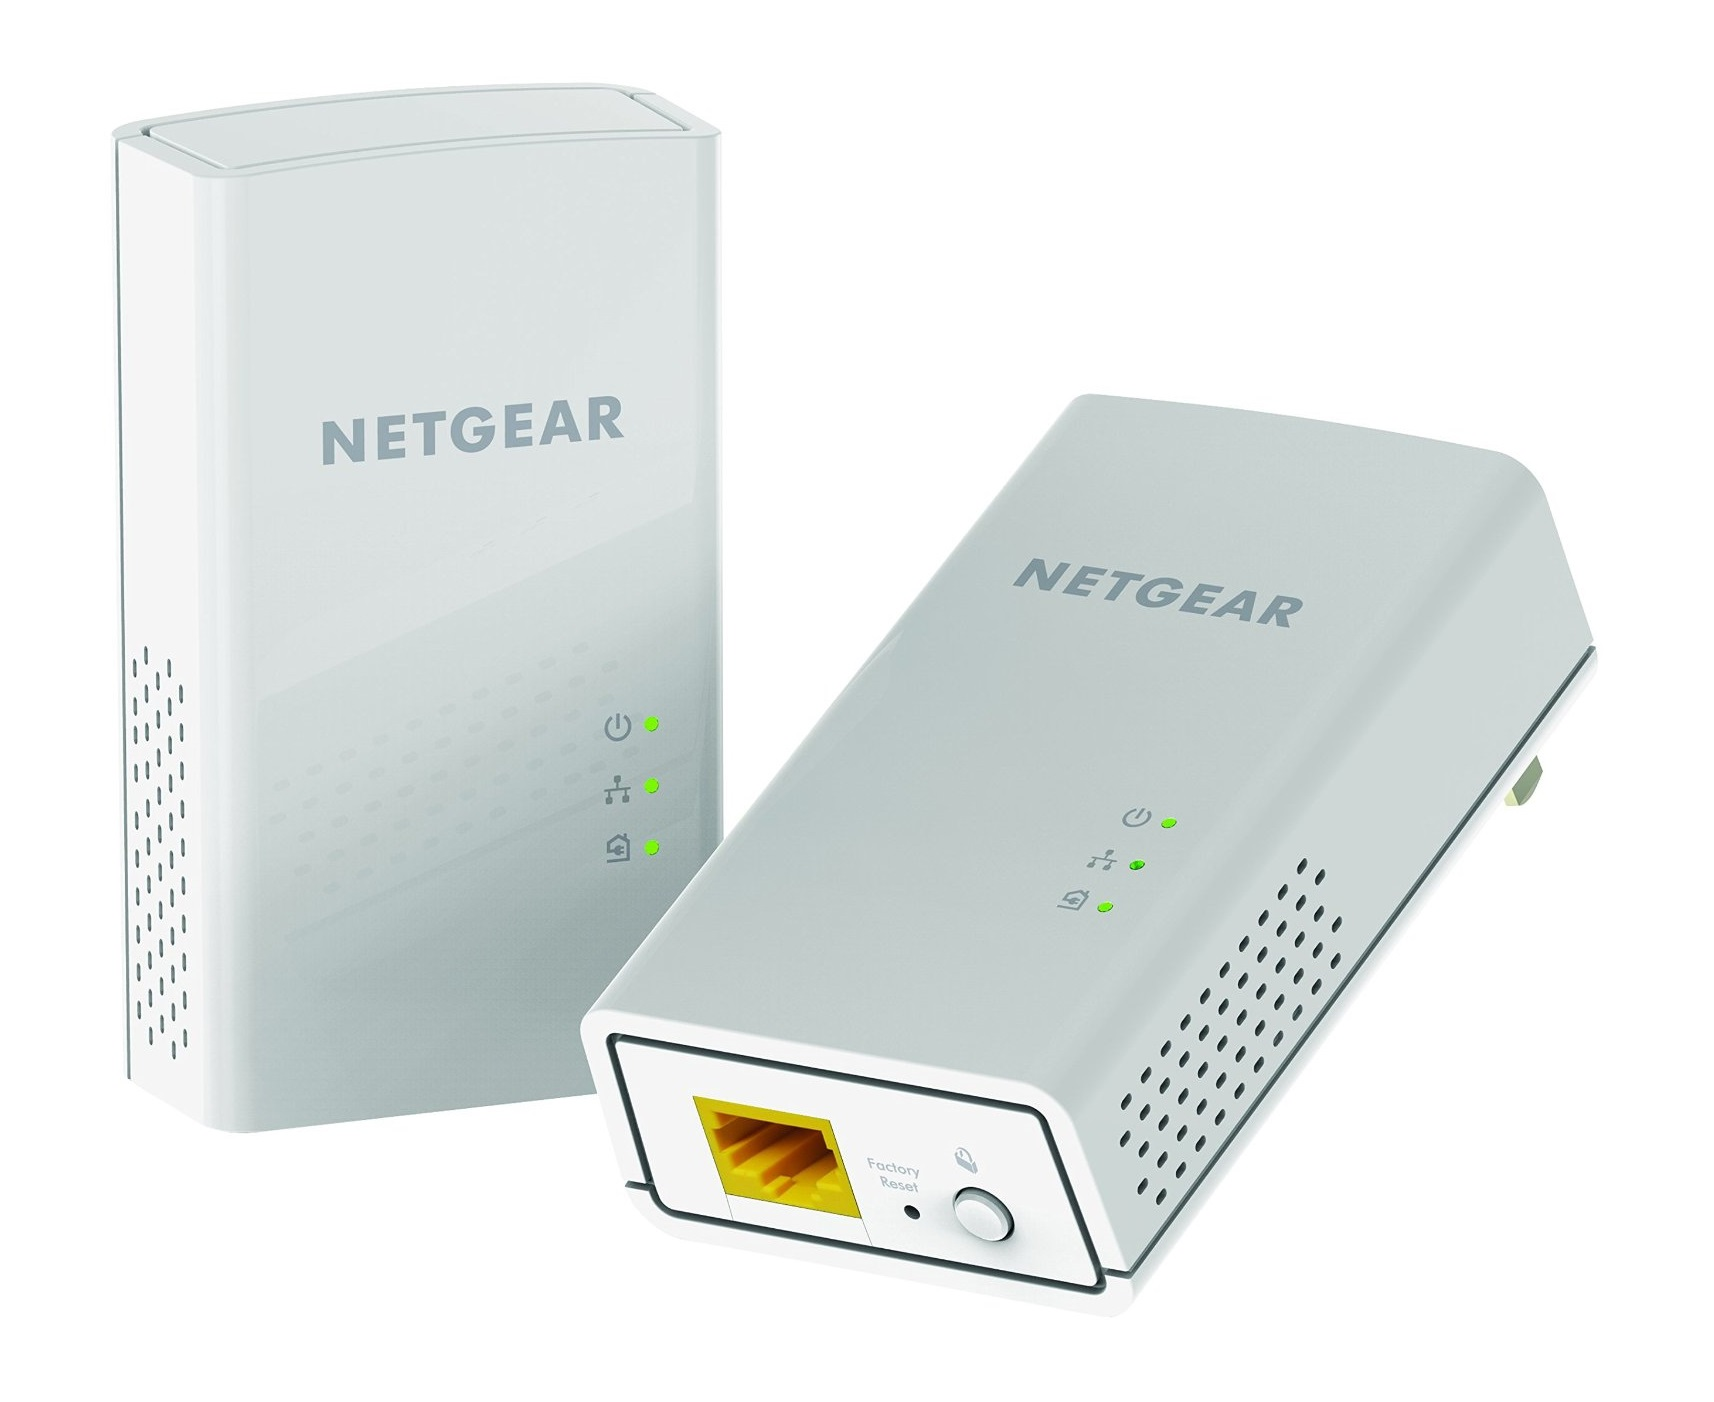 NETGEAR 2PT GIGABIT PWLINE 1200 BNDL, PL1200